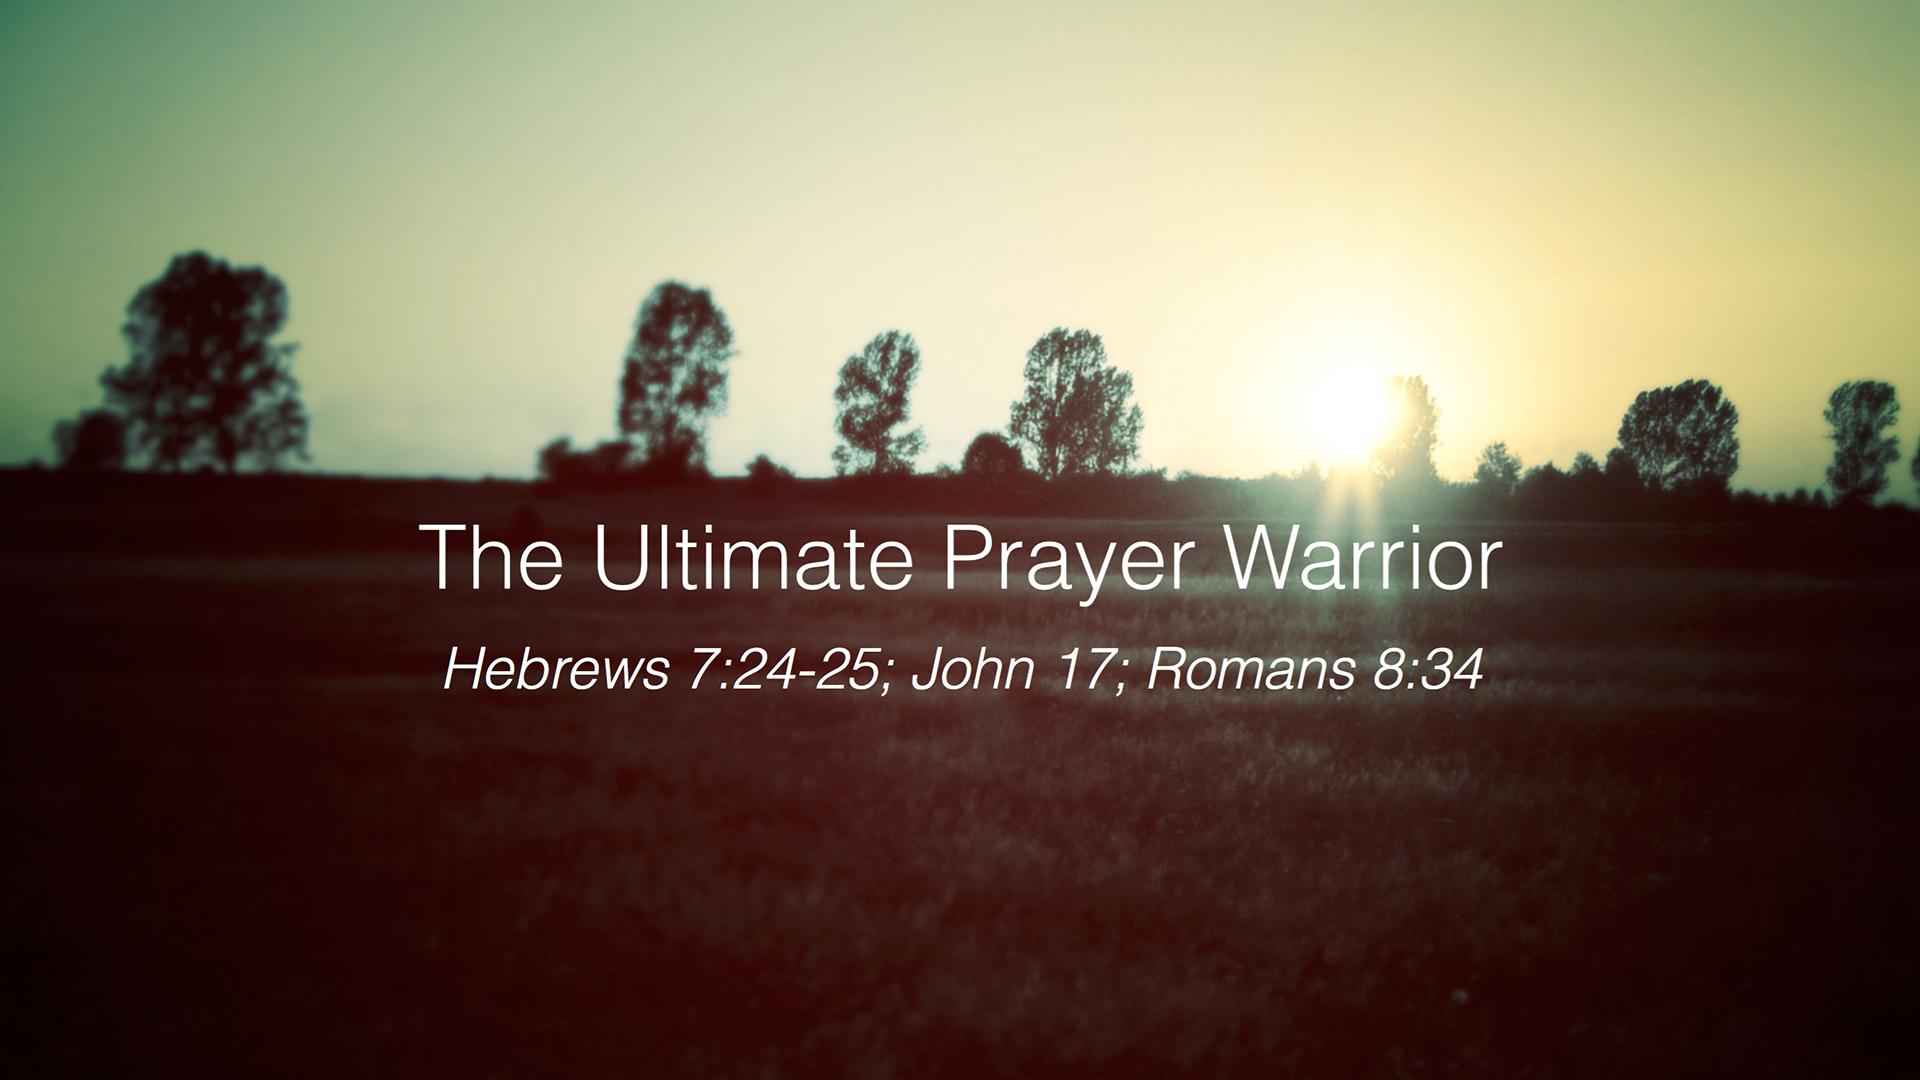 The Ultimate Prayer Warrior.jpg